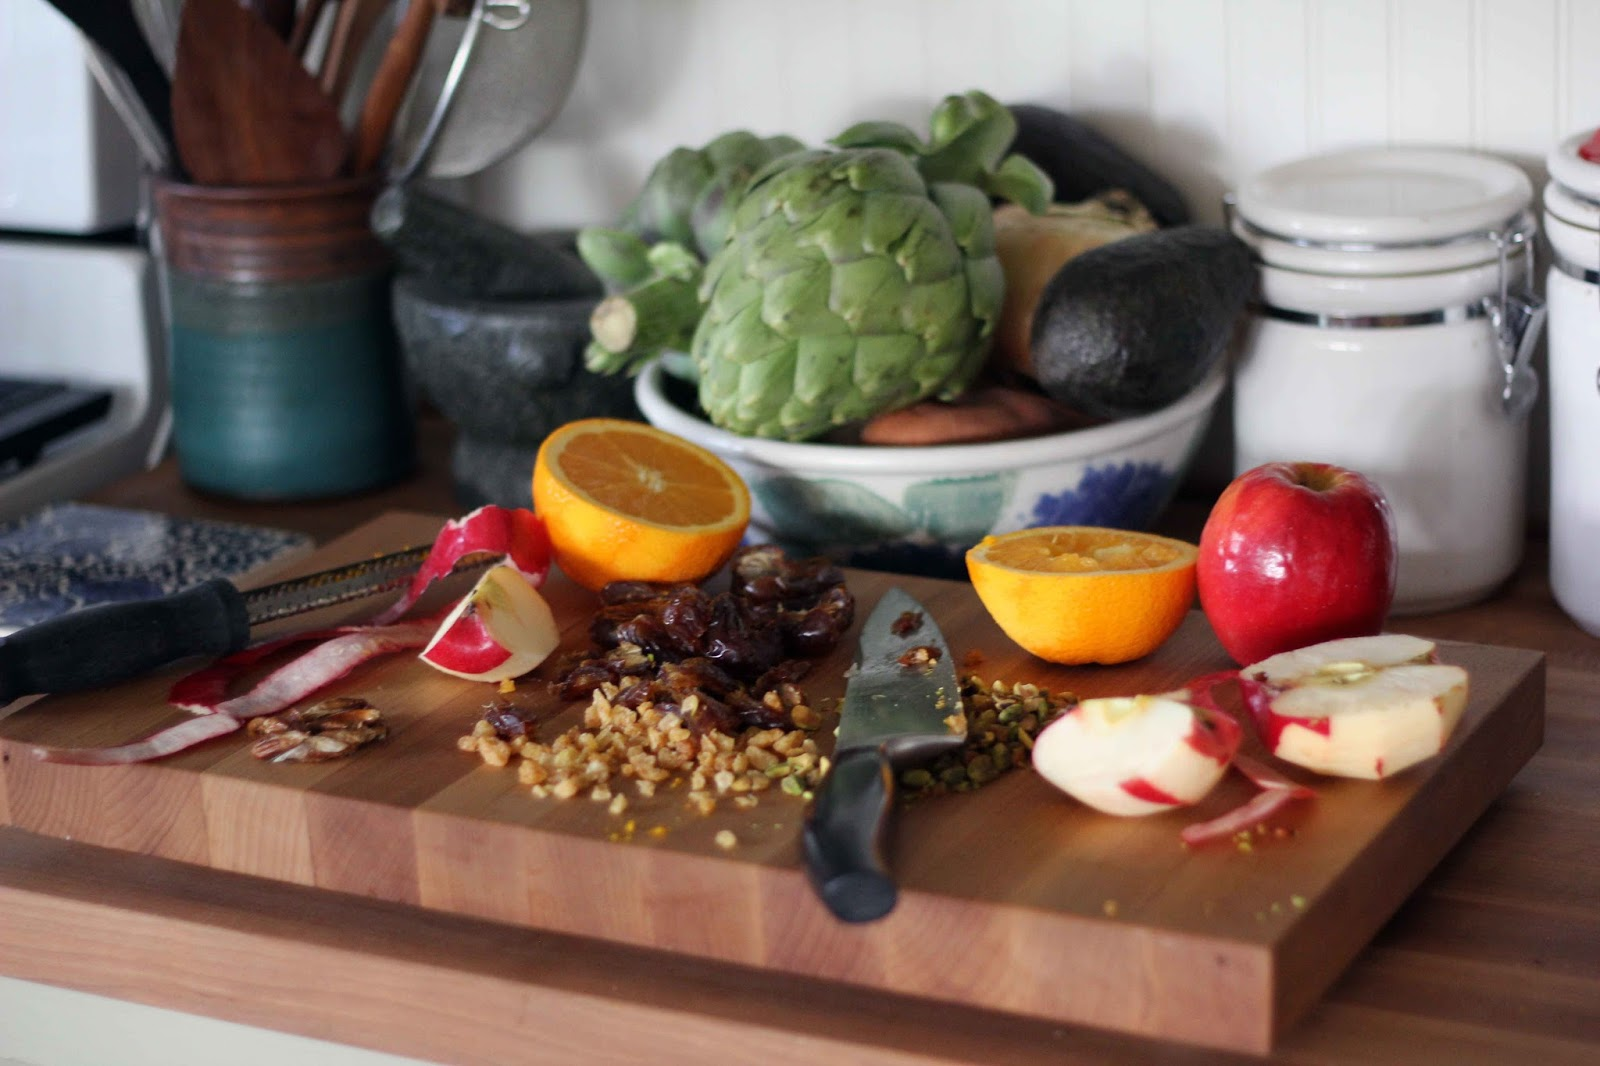 Blue Kale Road: Turkish Haroset for Passover